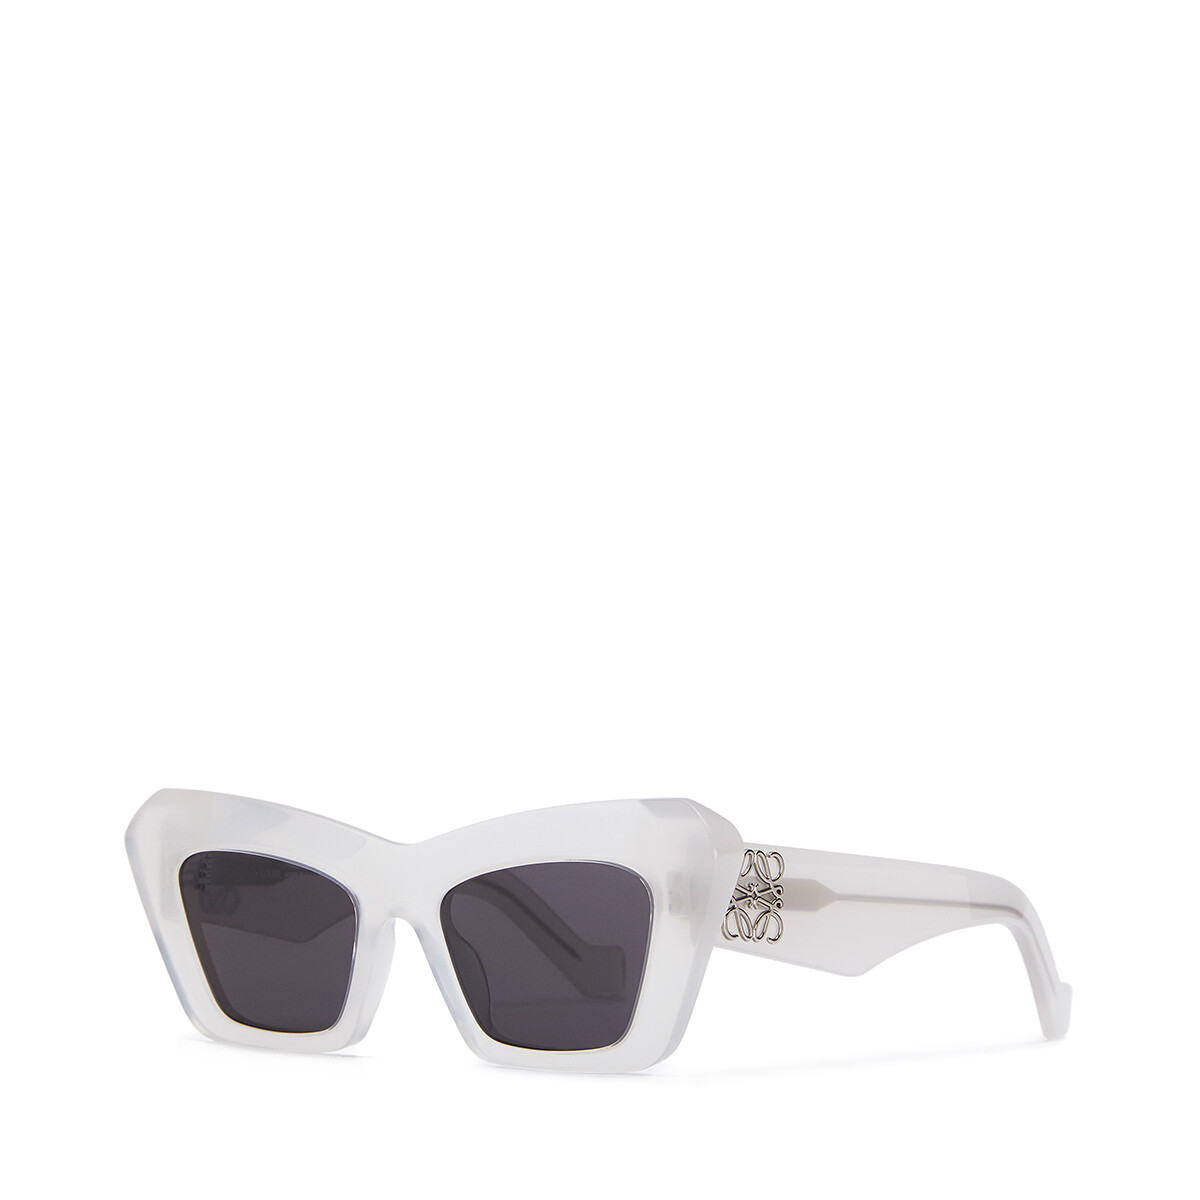 LOEWE Gafas De Sol Acetato Cateye Blanco Hielo front